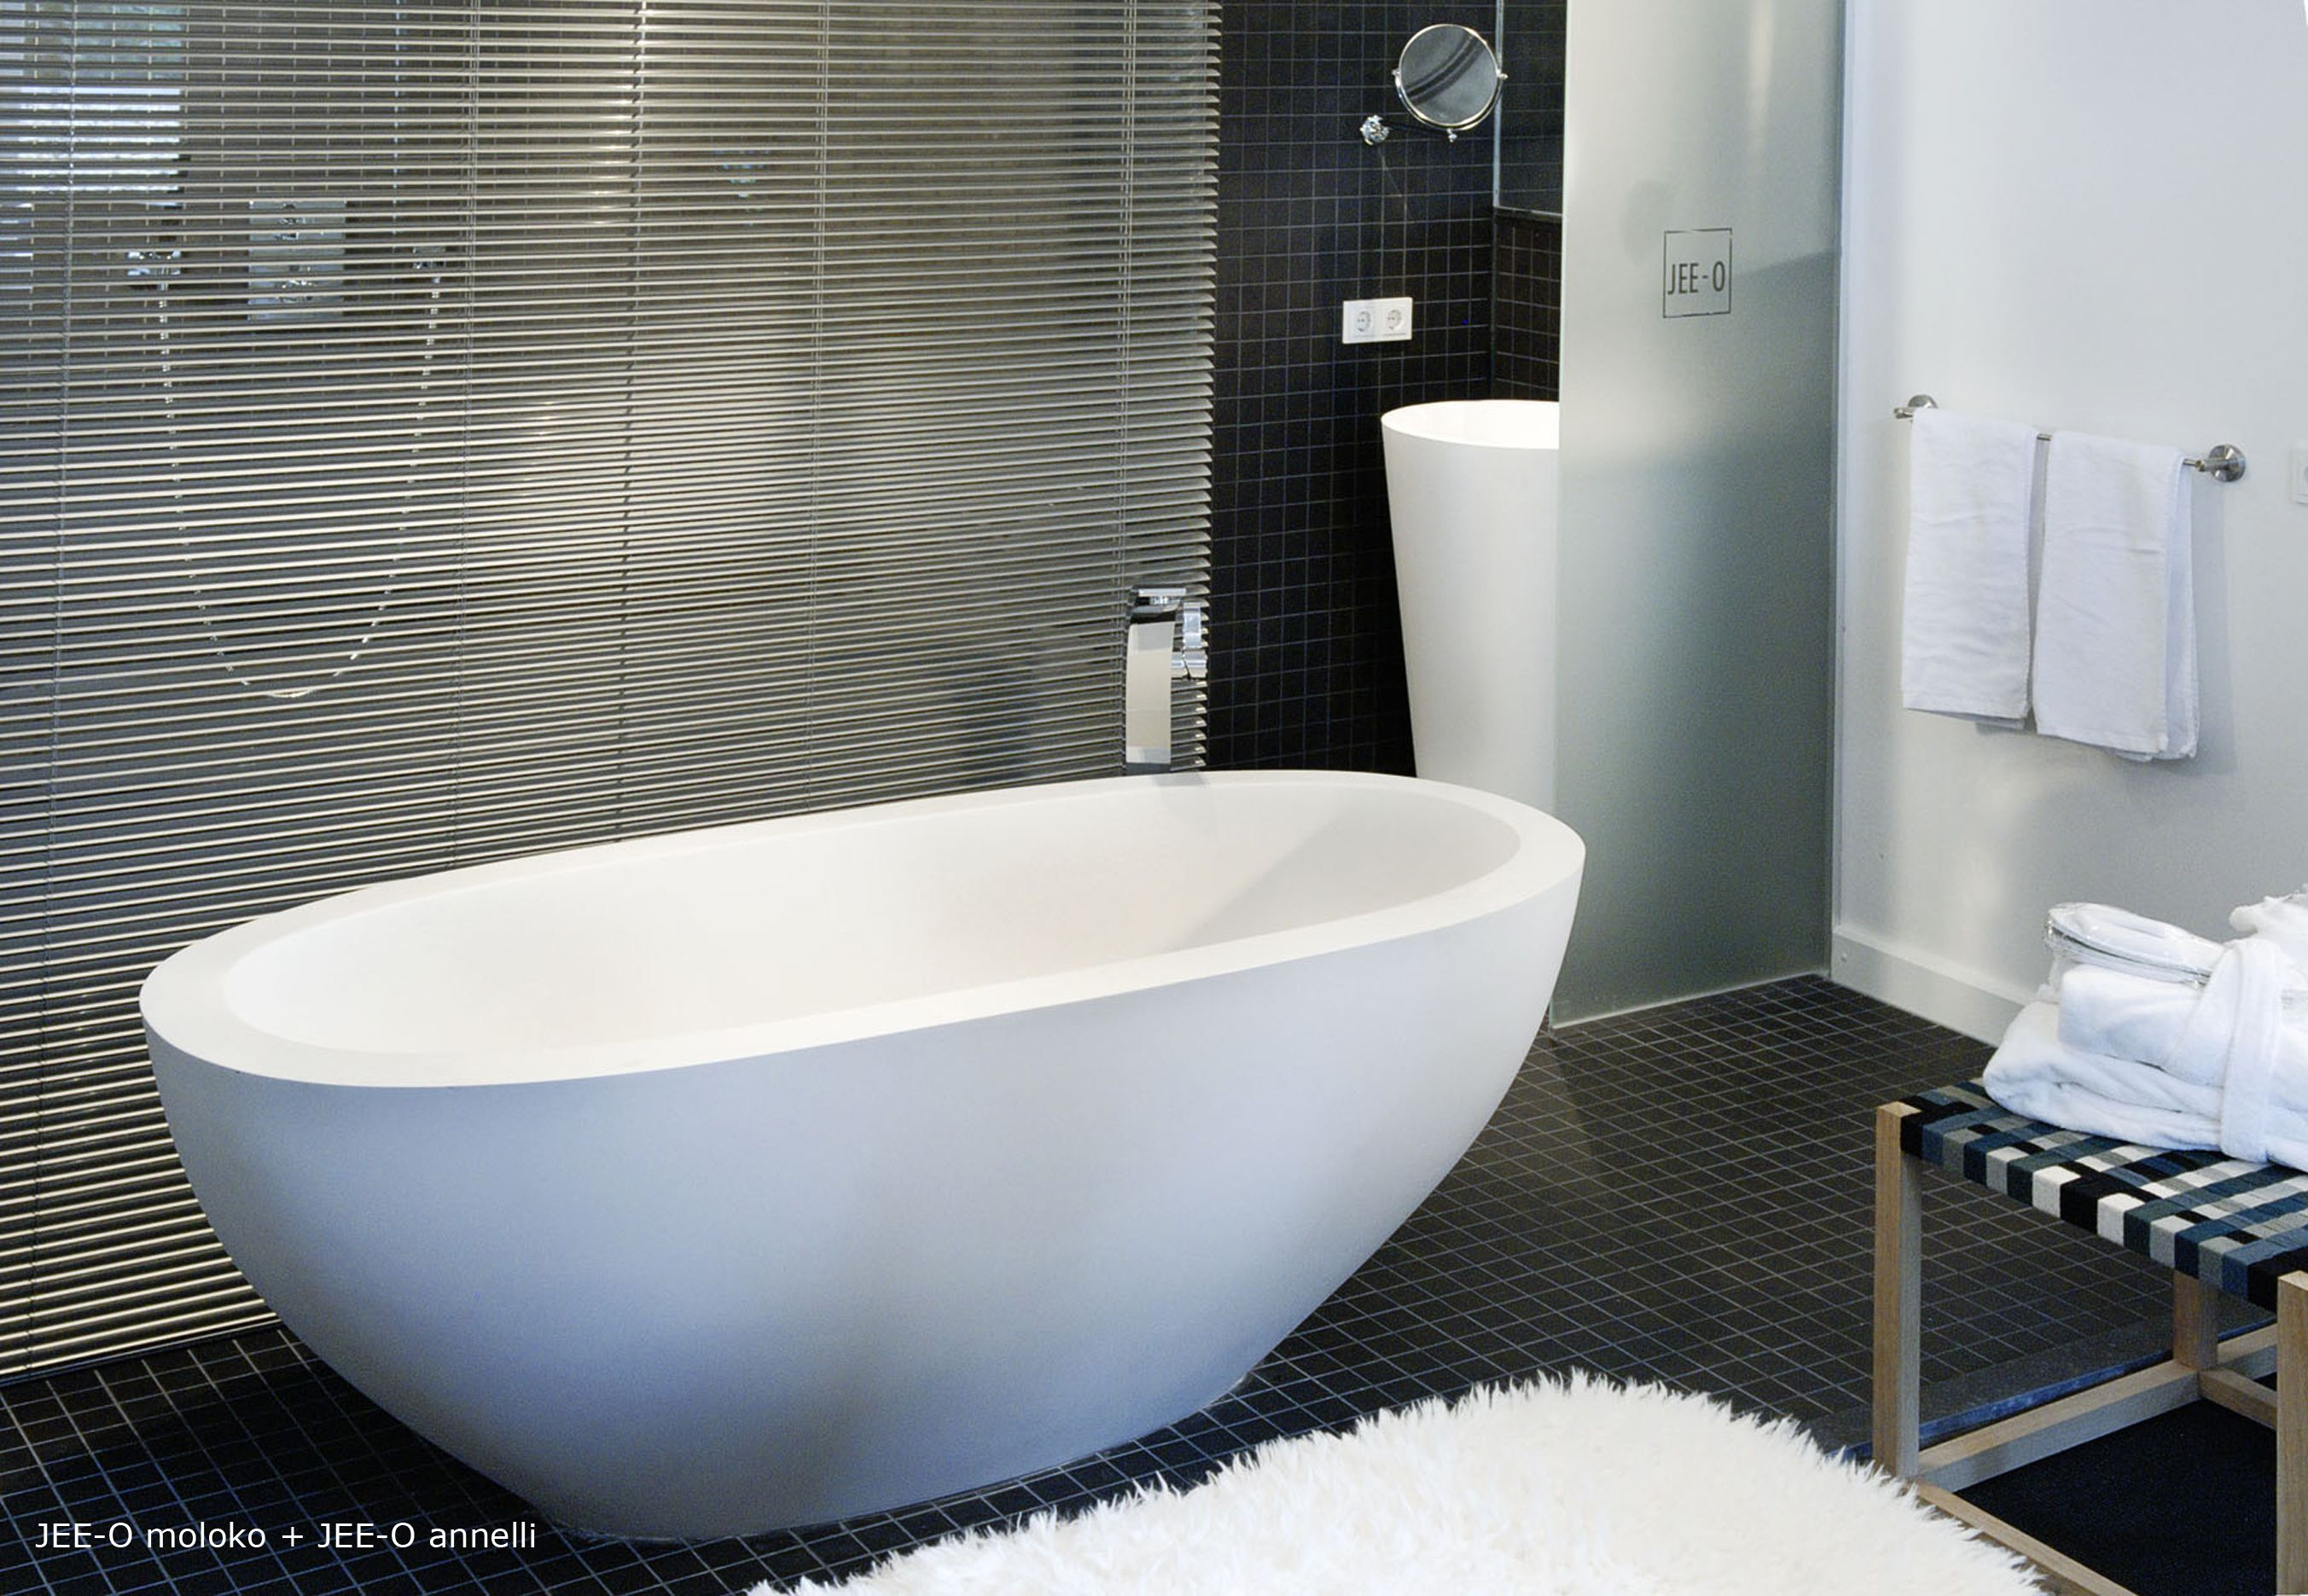 Design Badkamer Nijmegen : Jee o moloko at manna nijmegen manna nijmegen pinterest badkamer